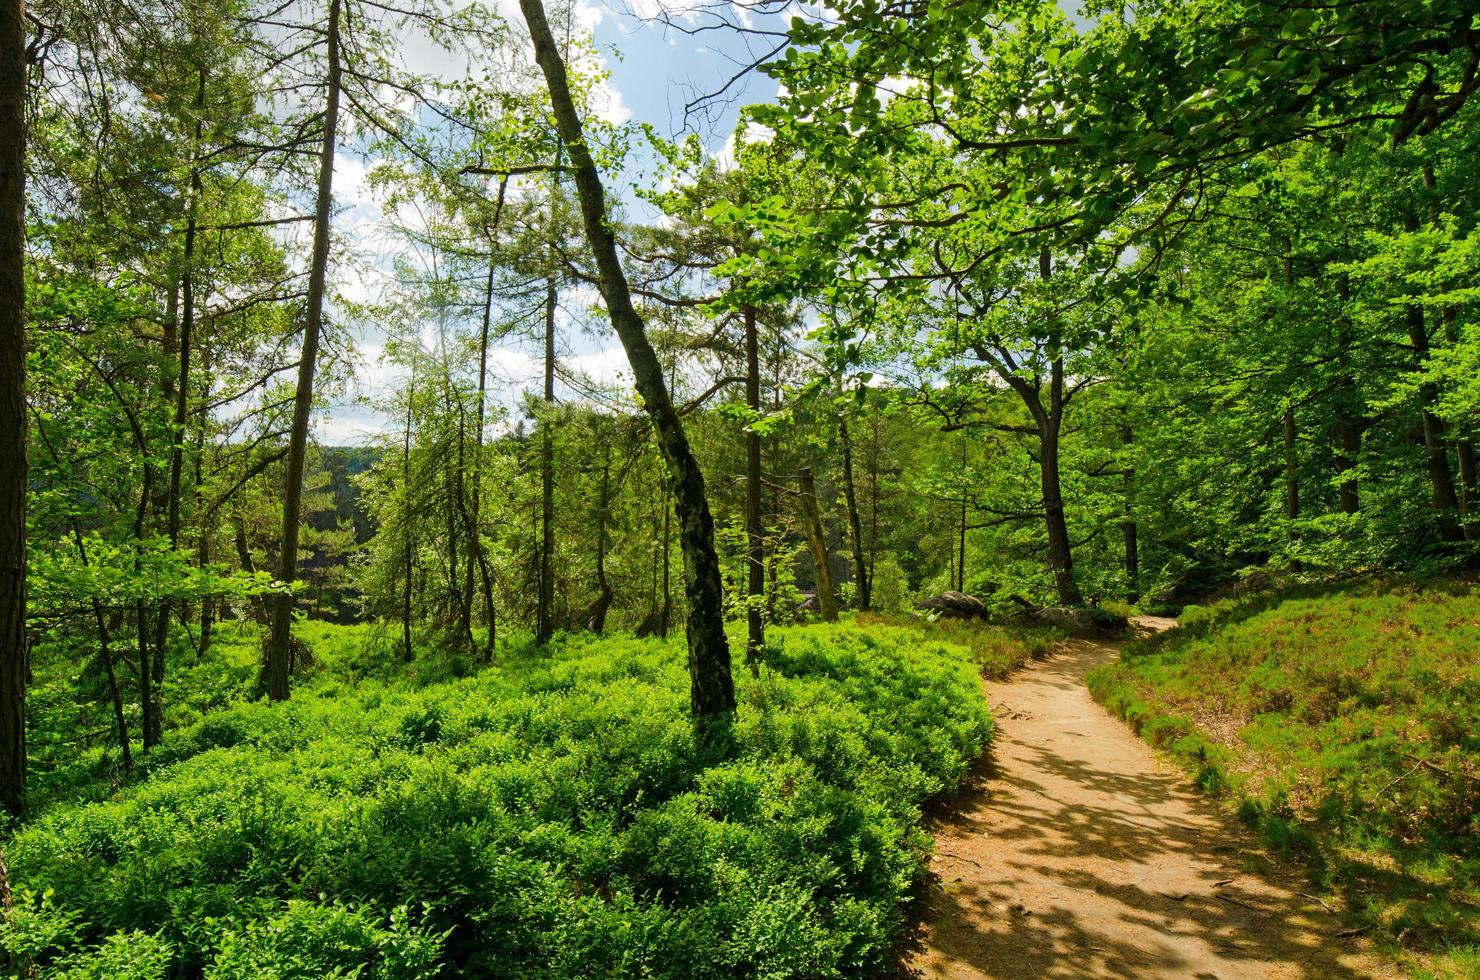 Beautiful path through nature photo